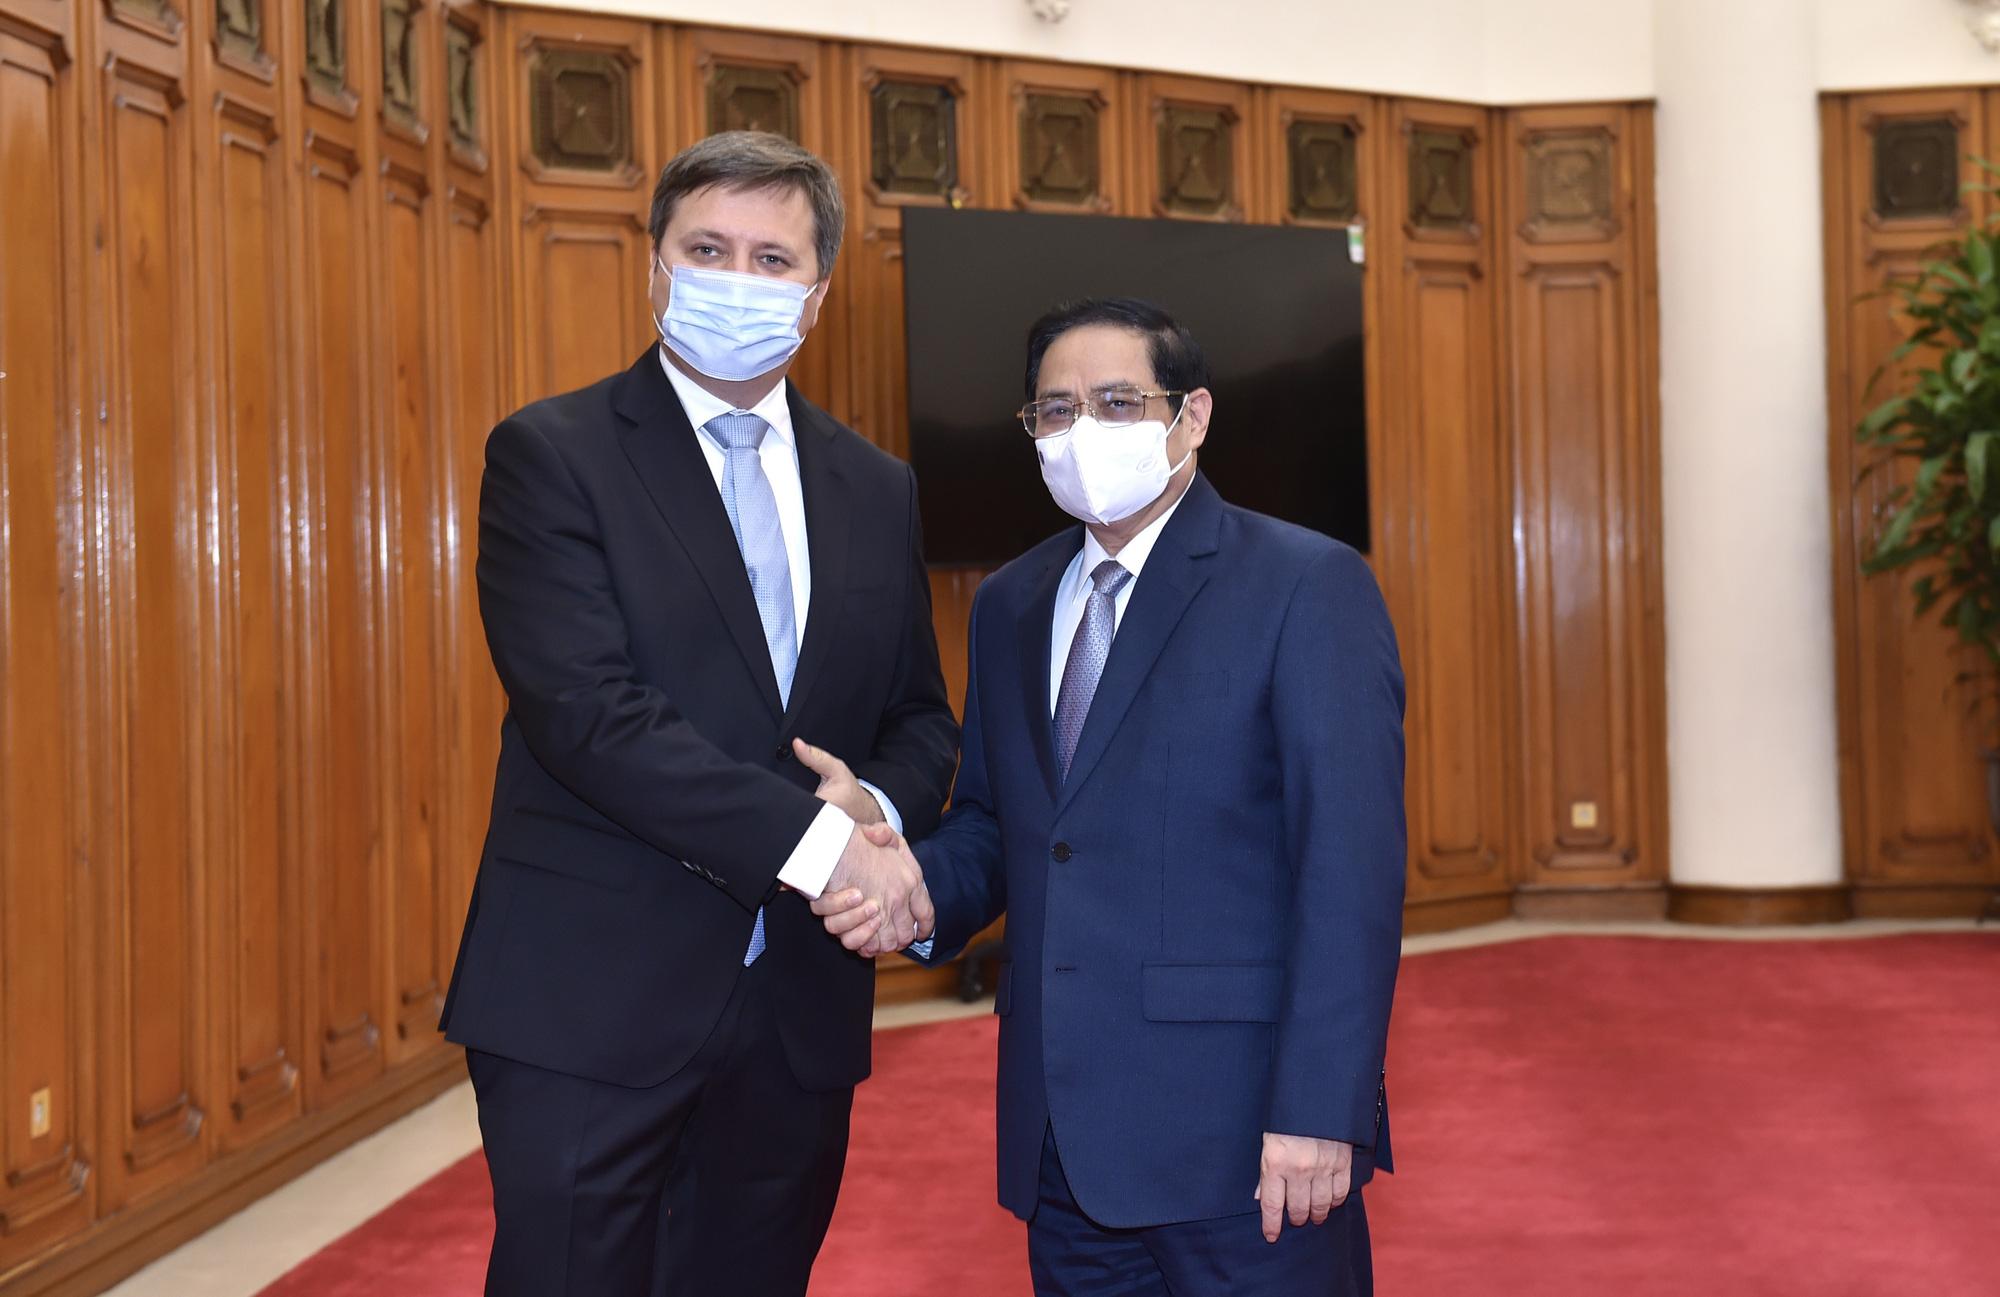 Poland donates over 500,000 COVID-19 vaccine doses to Vietnam